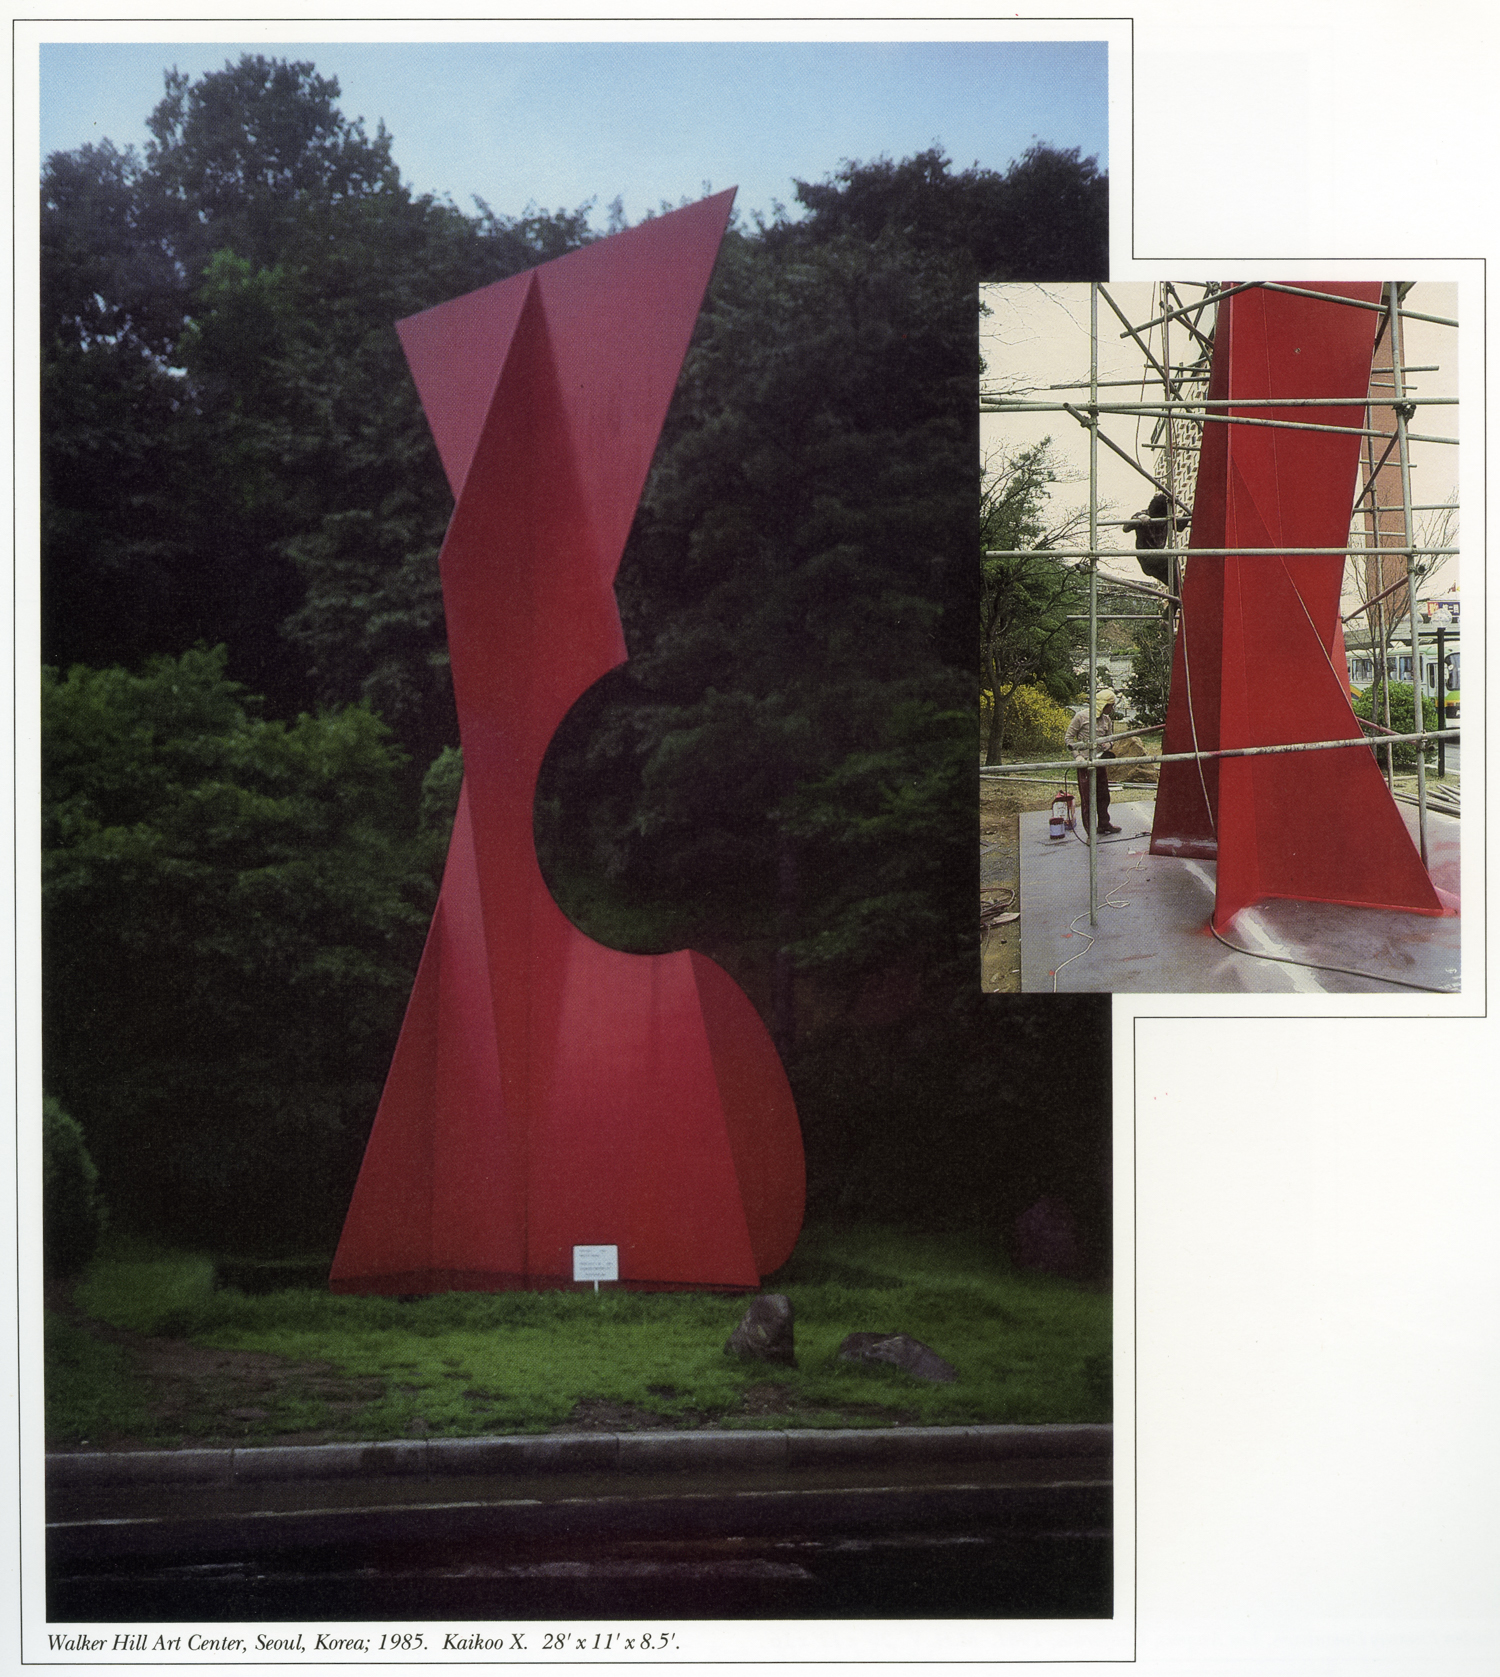 Walker Hill Art Center, Seoul, South Korea; 1985.  Kaikoo X.  28' x 11' x 8.5'.